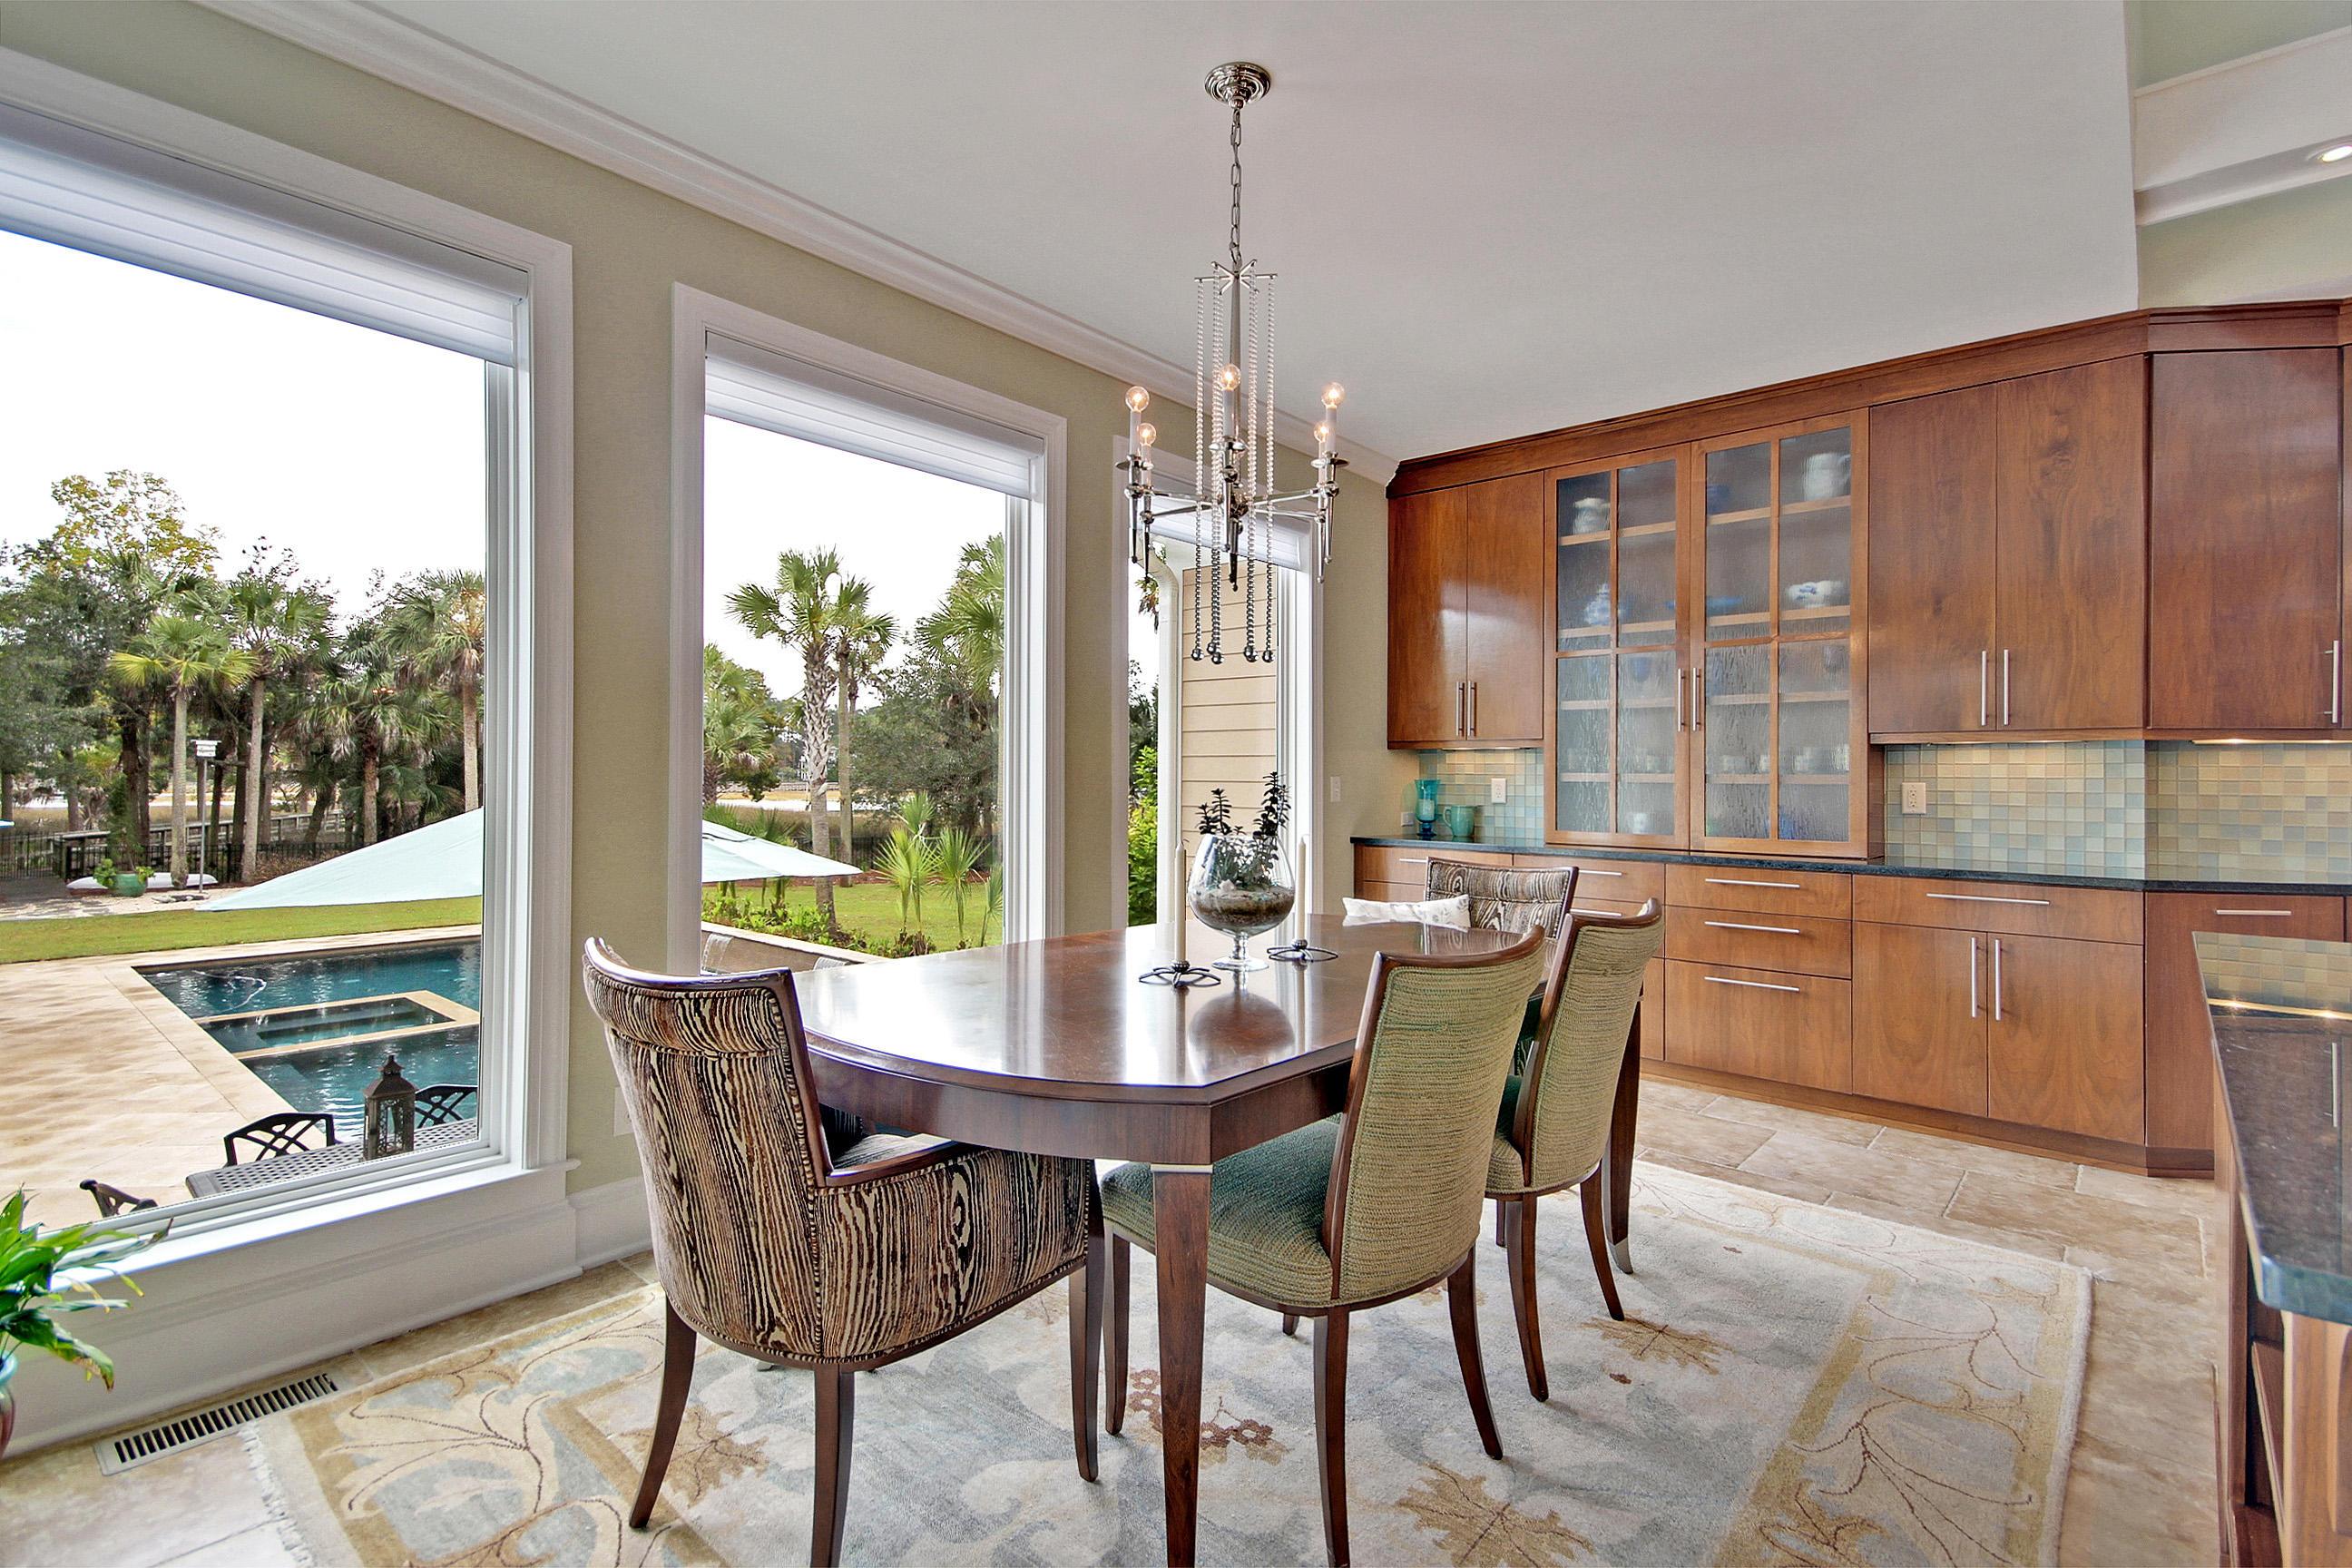 Dunes West Homes For Sale - 2364 Darts Cove, Mount Pleasant, SC - 29